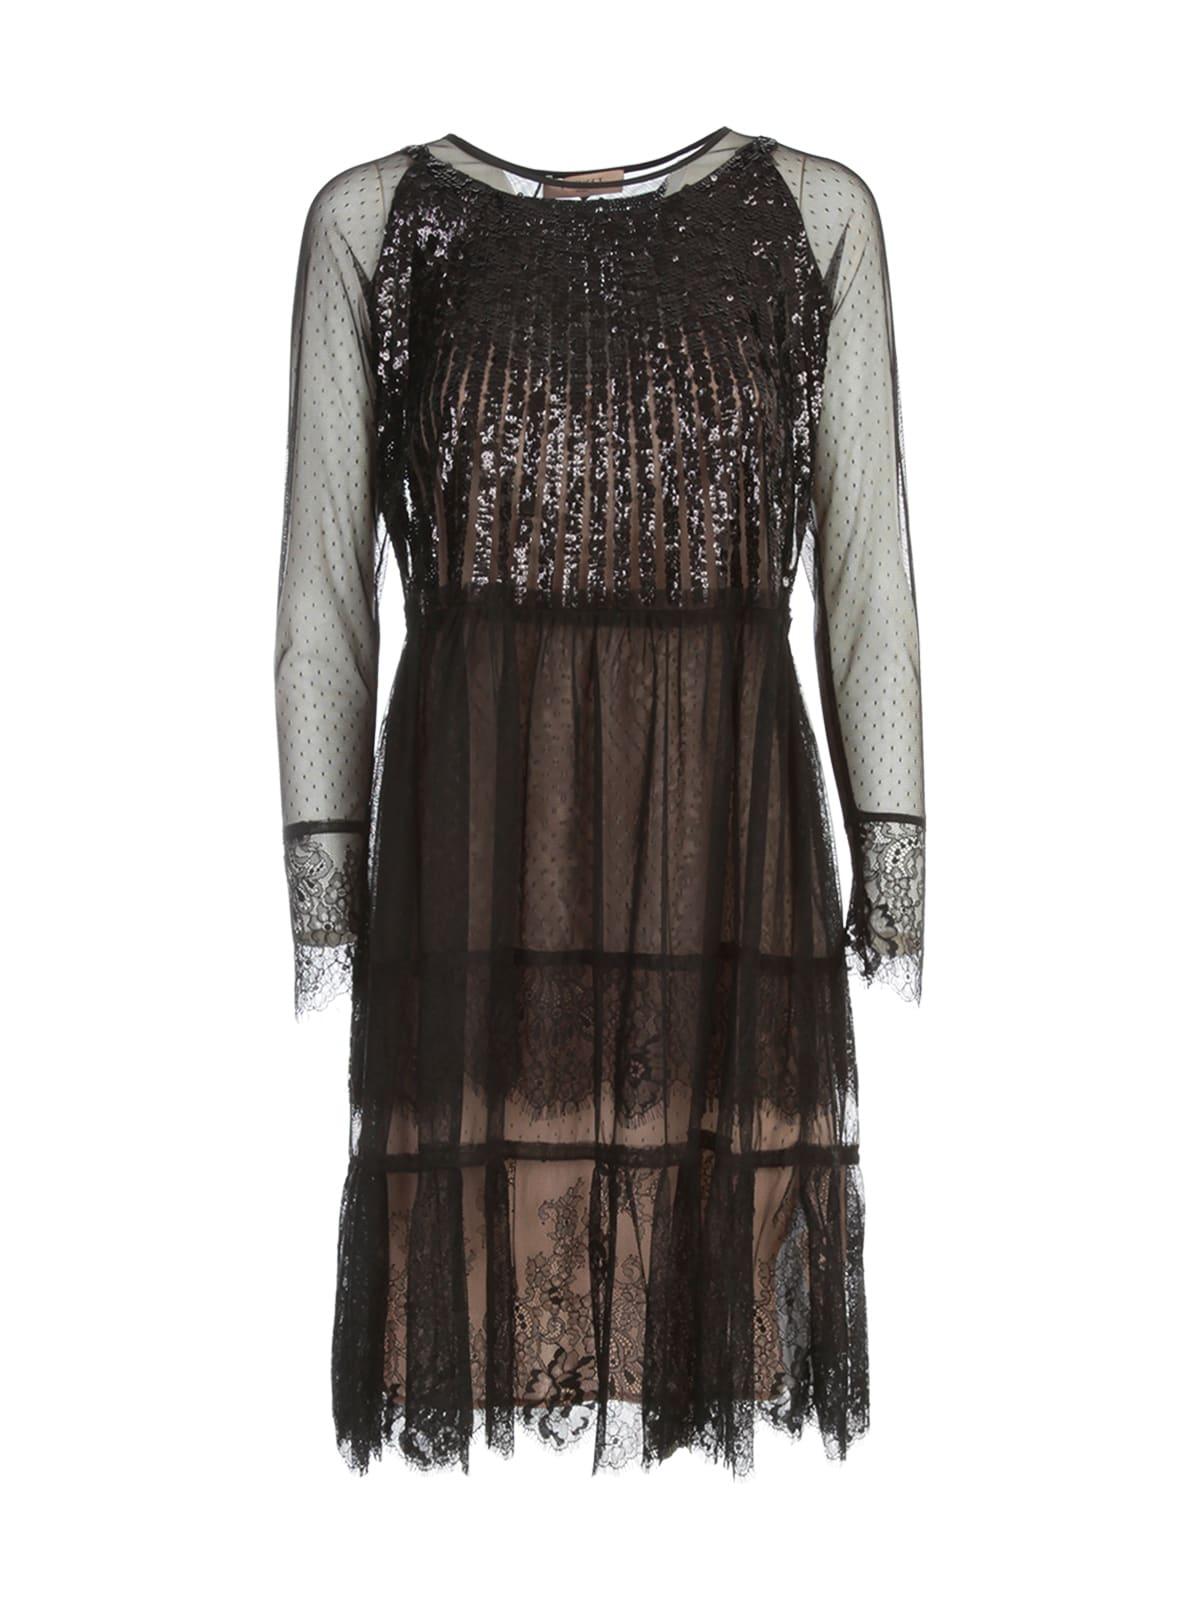 TwinSet Laced Dress L/s W/paillettes